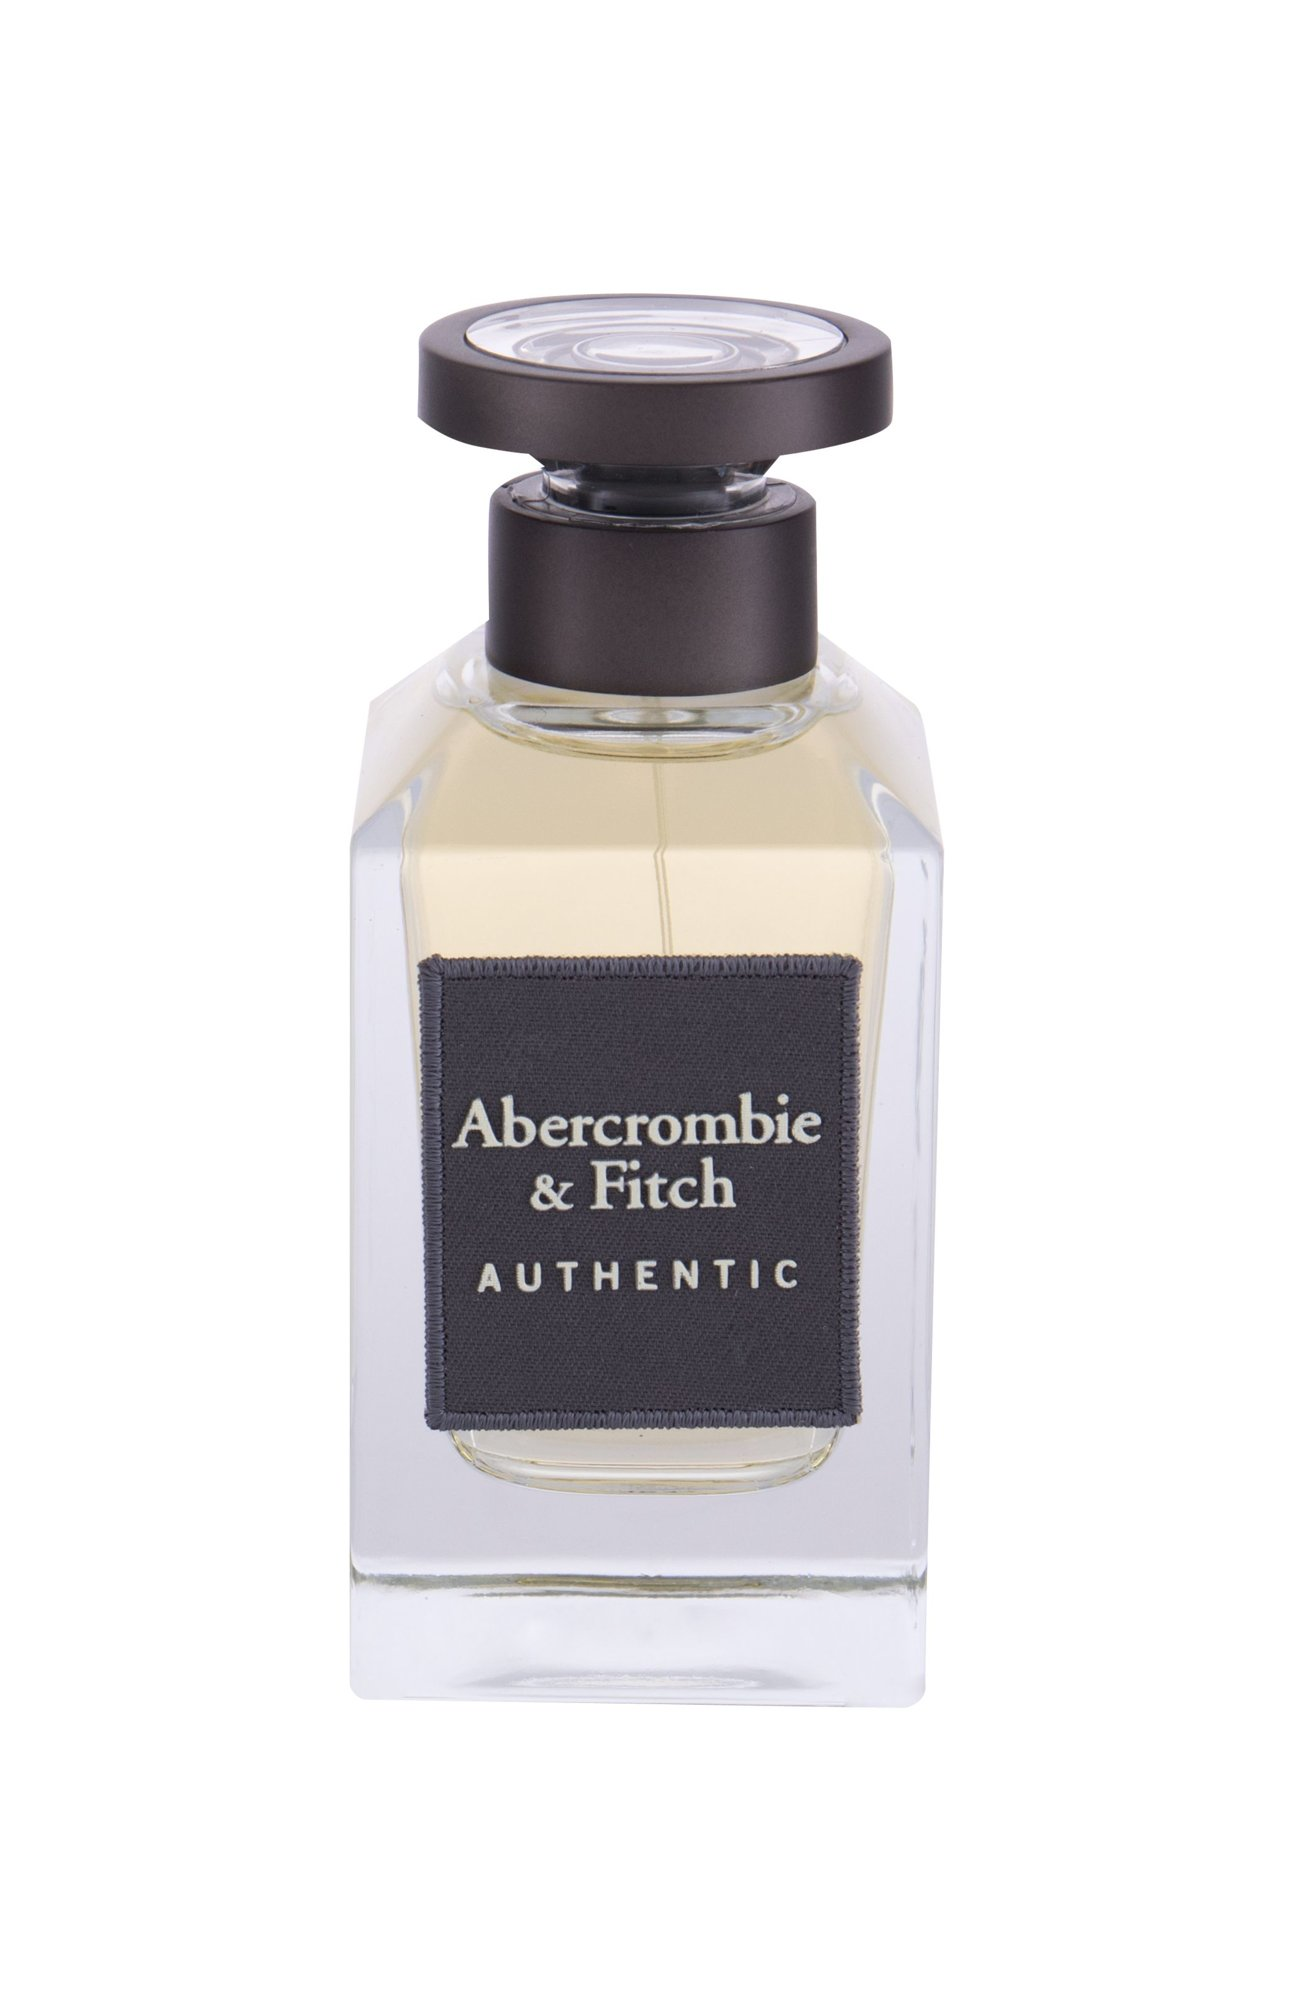 Abercrombie & Fitch Authentic, Toaletní voda 100ml